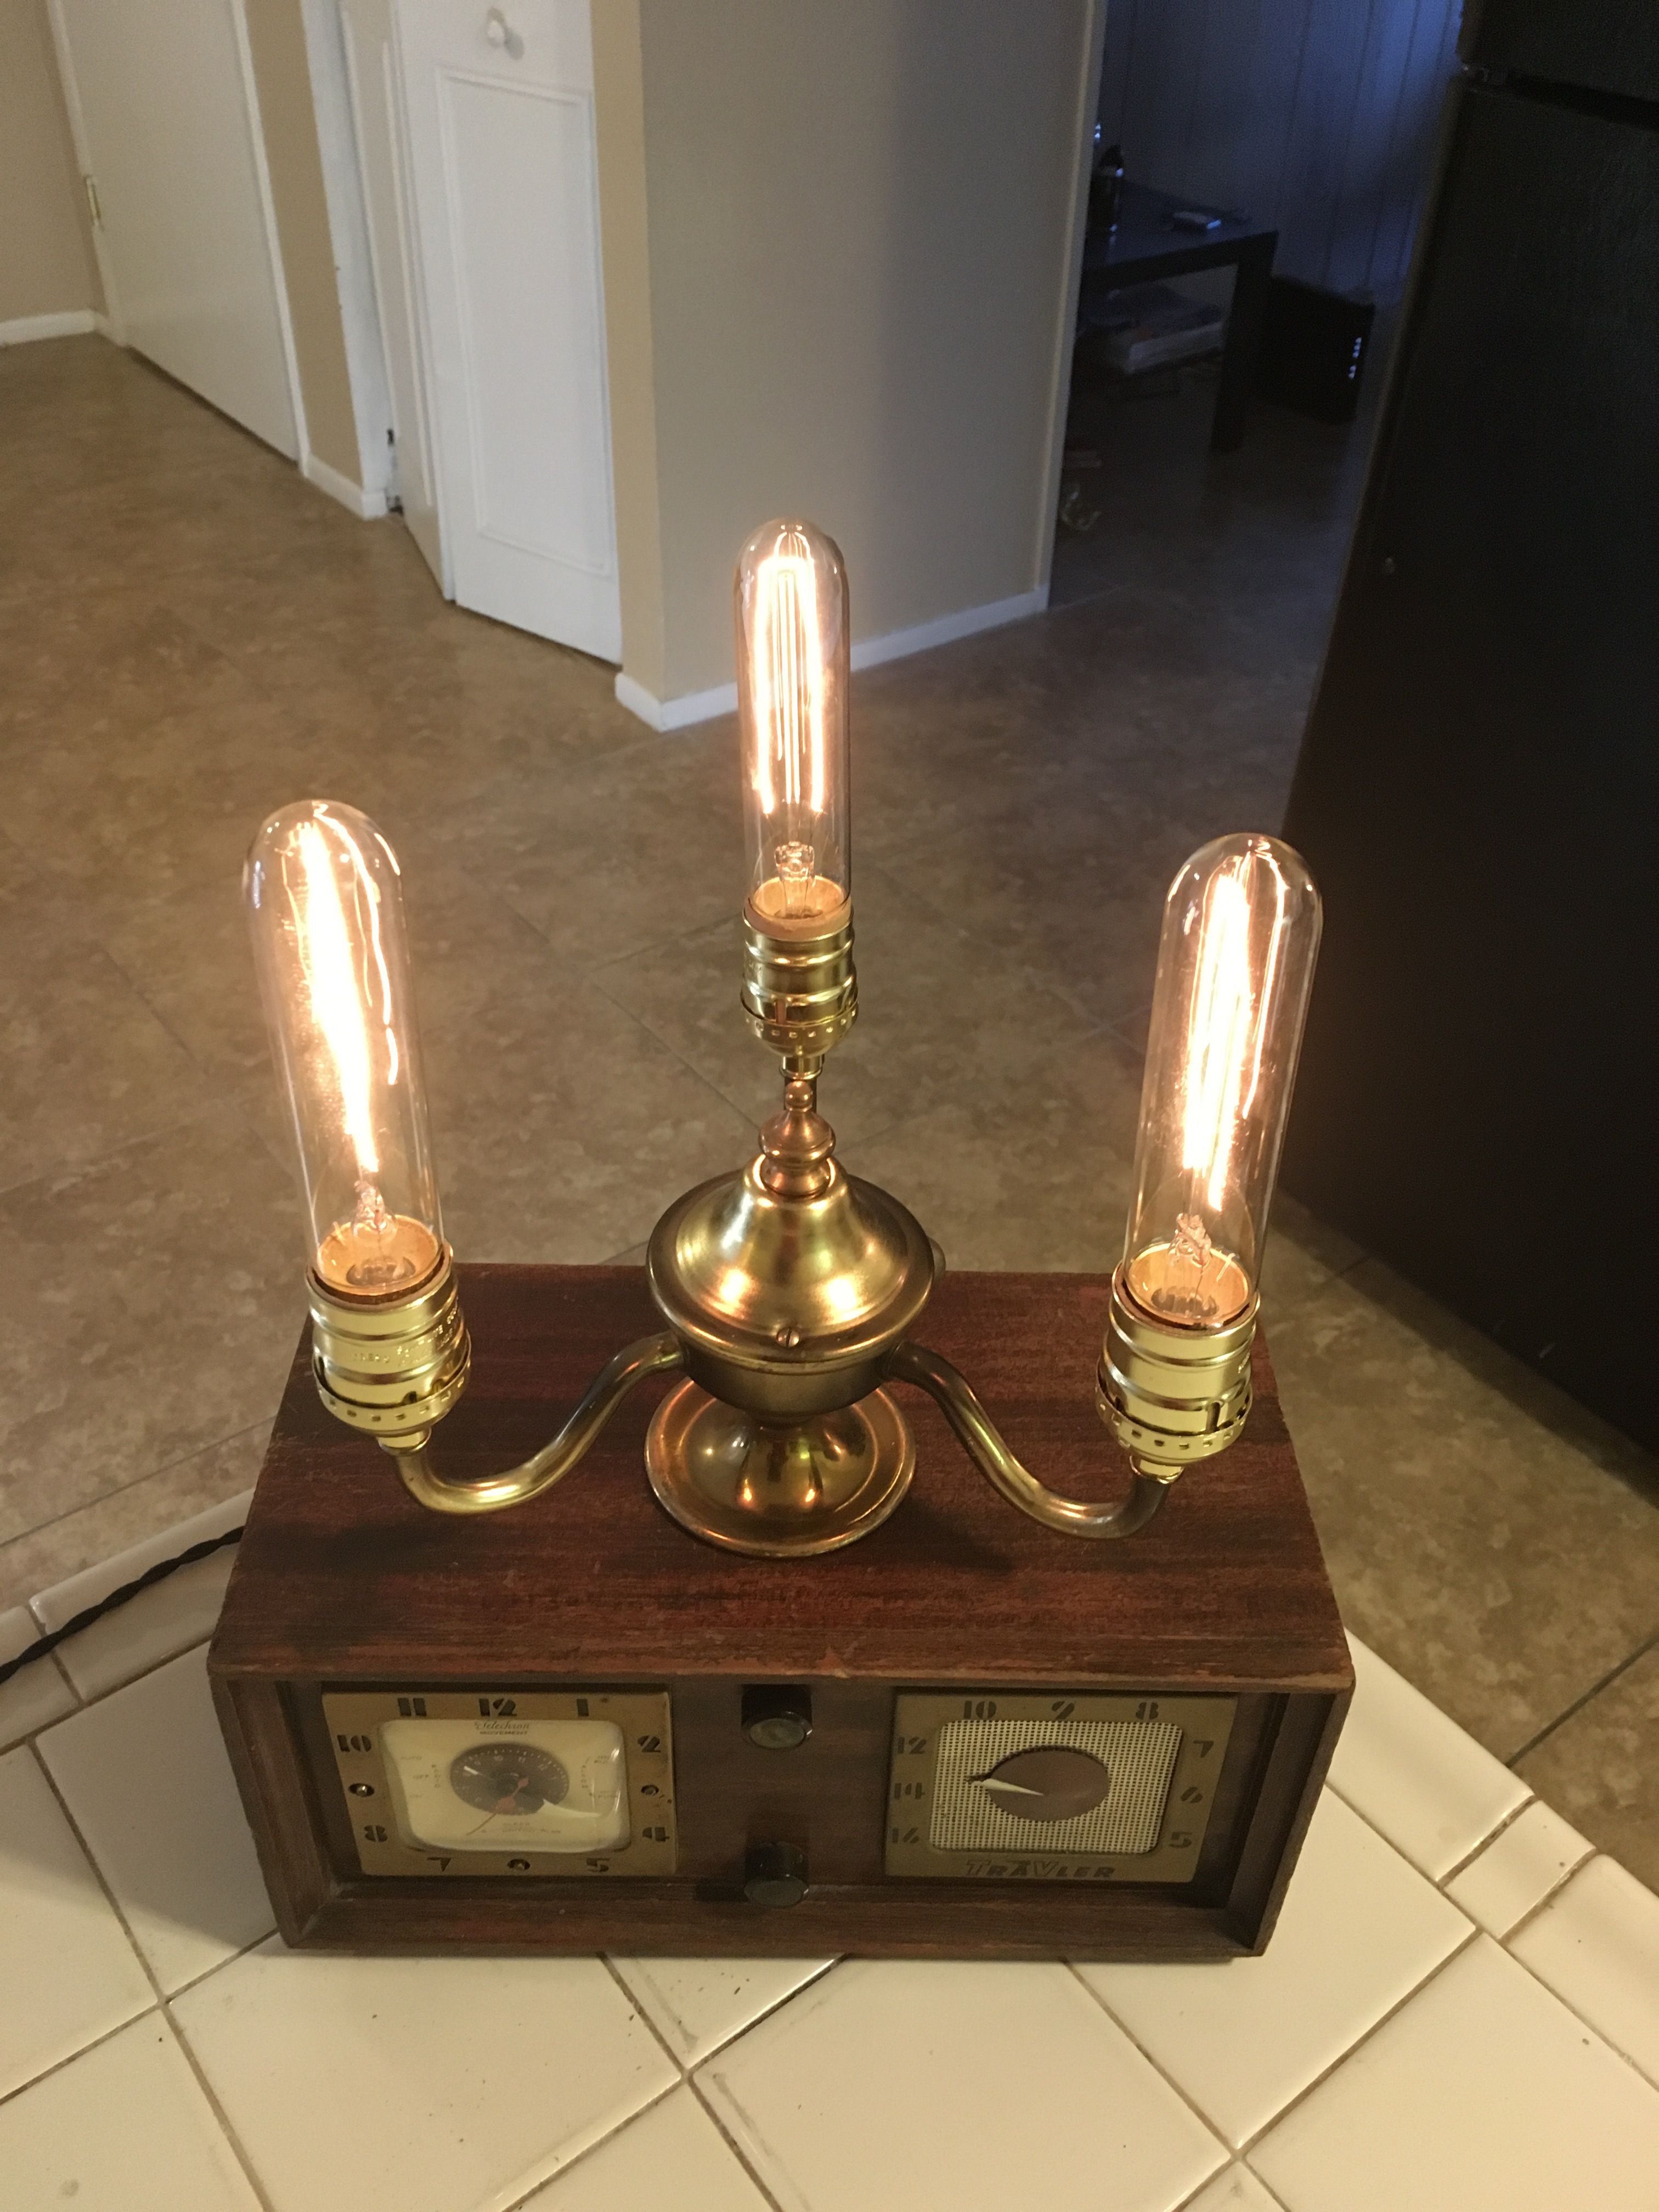 Vintage Radio Lamp With Edison Bulb Edison Bulb Edison Light Bulbs Vintage Radio